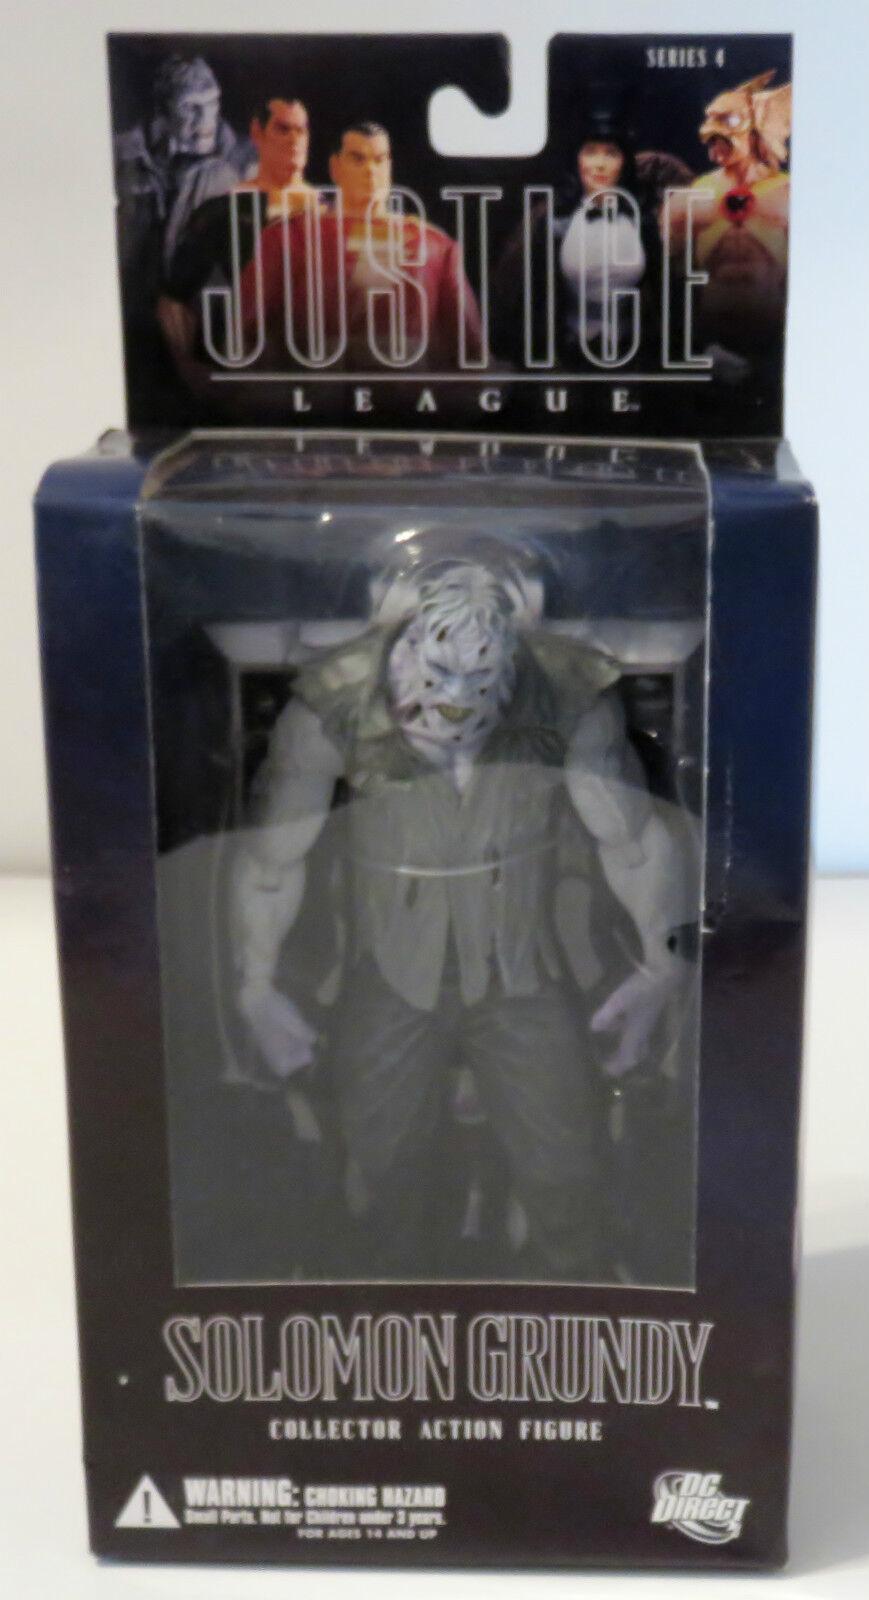 Alex Ross Justice League : Series 4 - Solomon Grundy Collector Action Figure